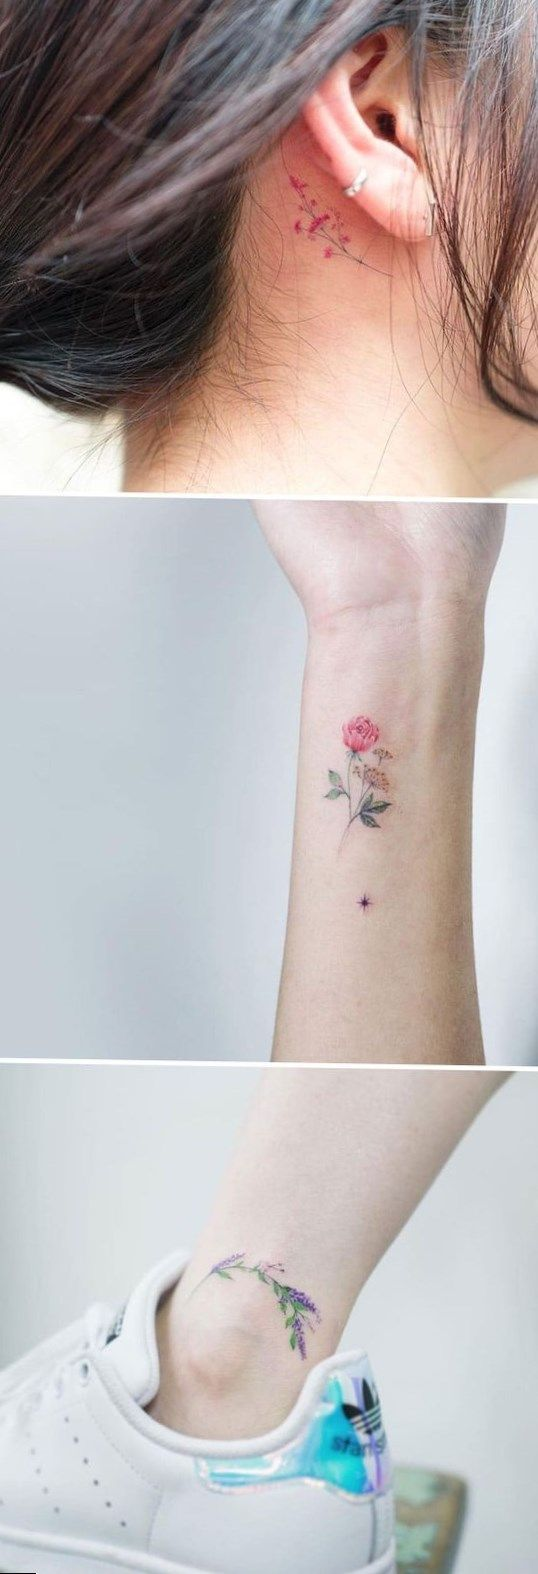 Small christian tattoo ideas for men designtattoo tattoo religious tattoos for men oriental design